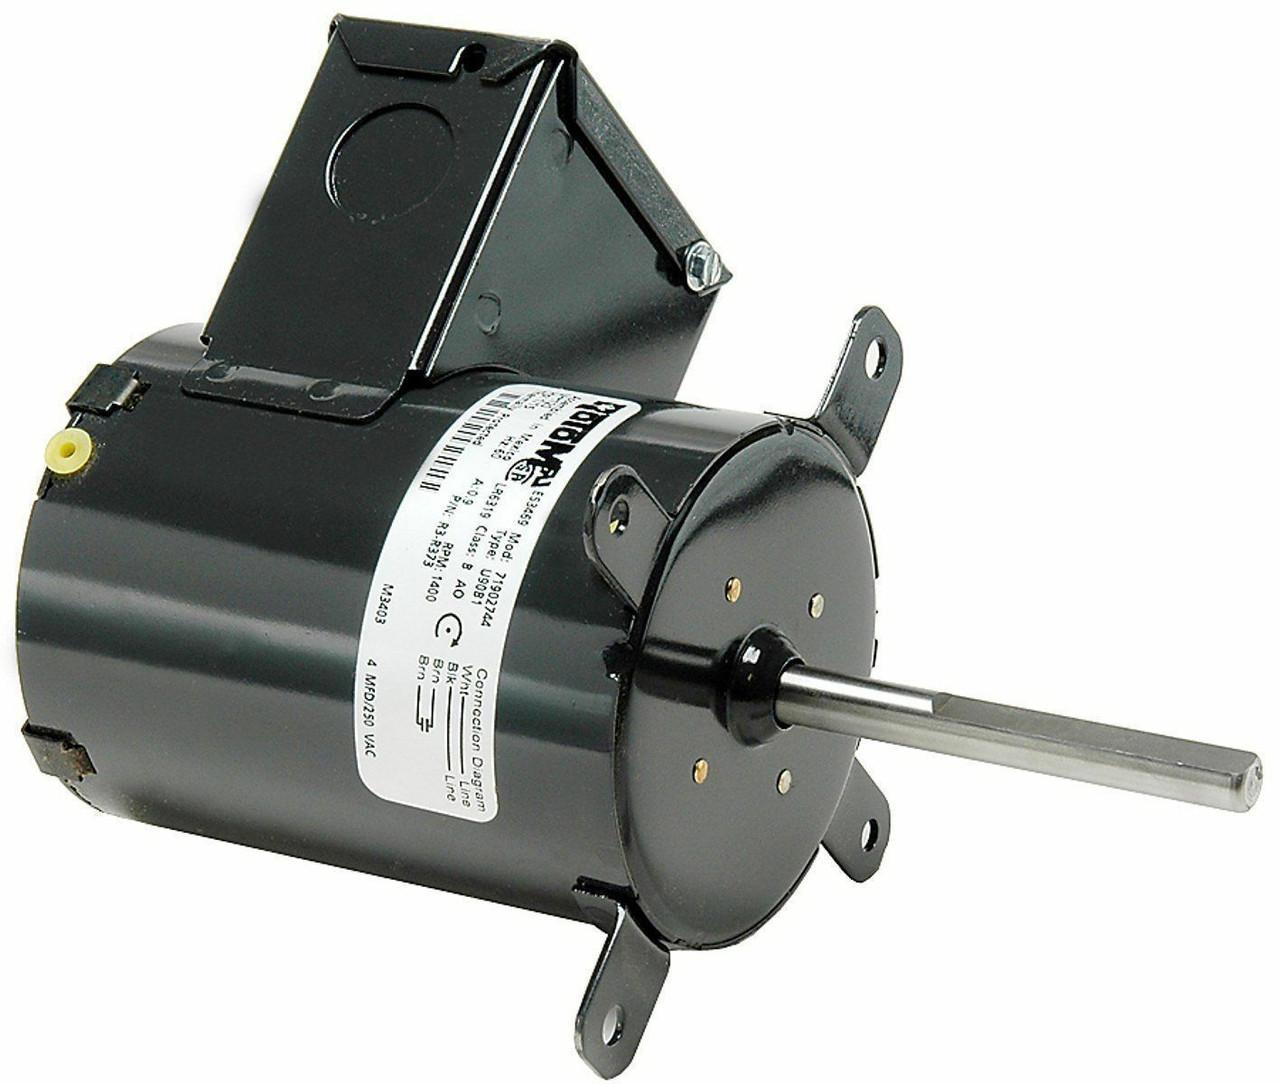 Dayton Greenhouse Fan Motor (7190-1004) 1/15 hp 1400 RPM CW 115V # R3-R373